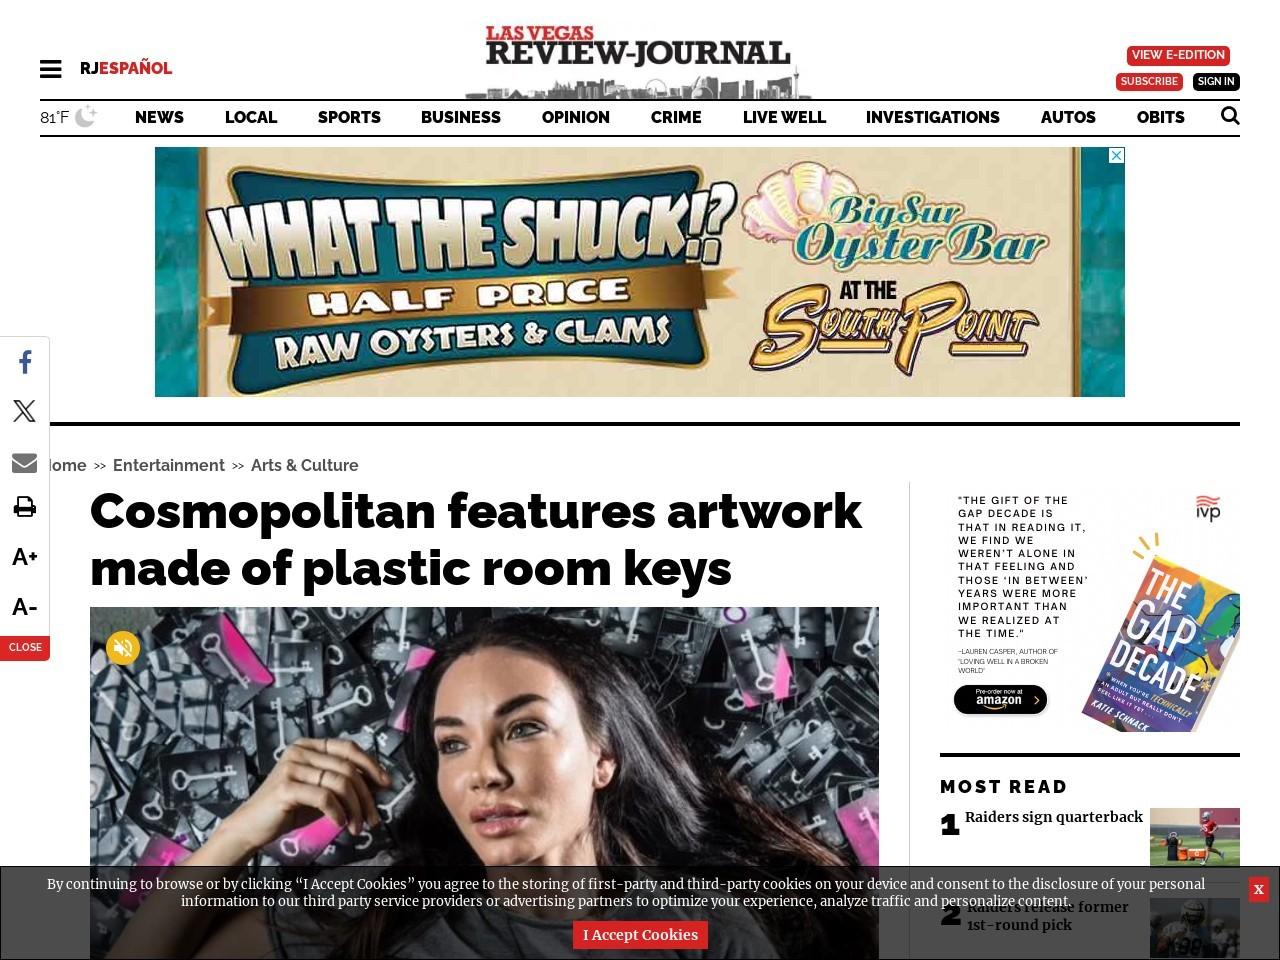 Cosmopolitan features art by Las Vegas woman made of plastic room keys